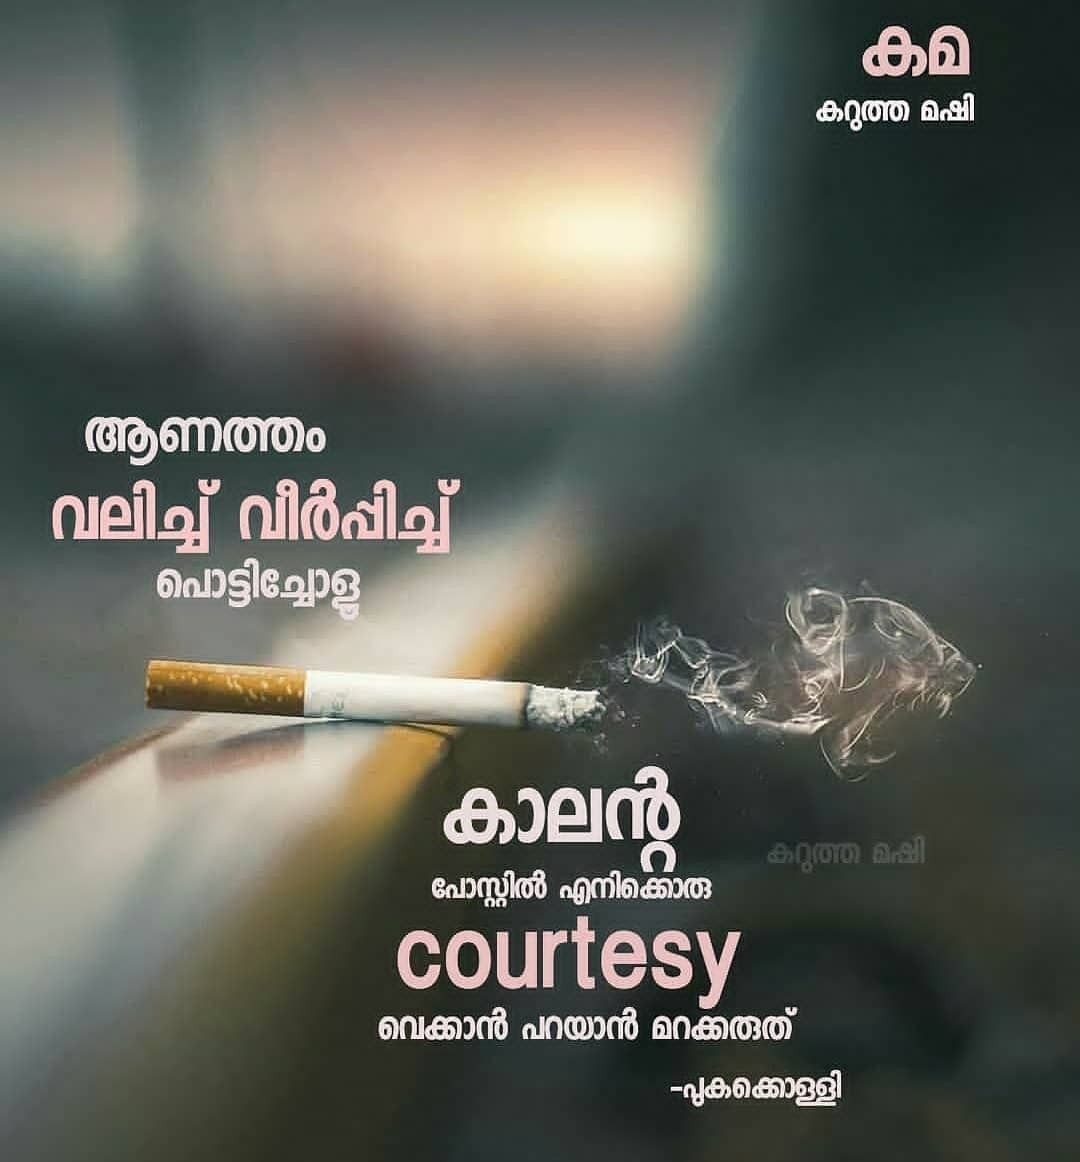 Broken Friendship Quotes Malayalam: Pin By Nanditha Binudas On QuotesampScribbles T Feelings